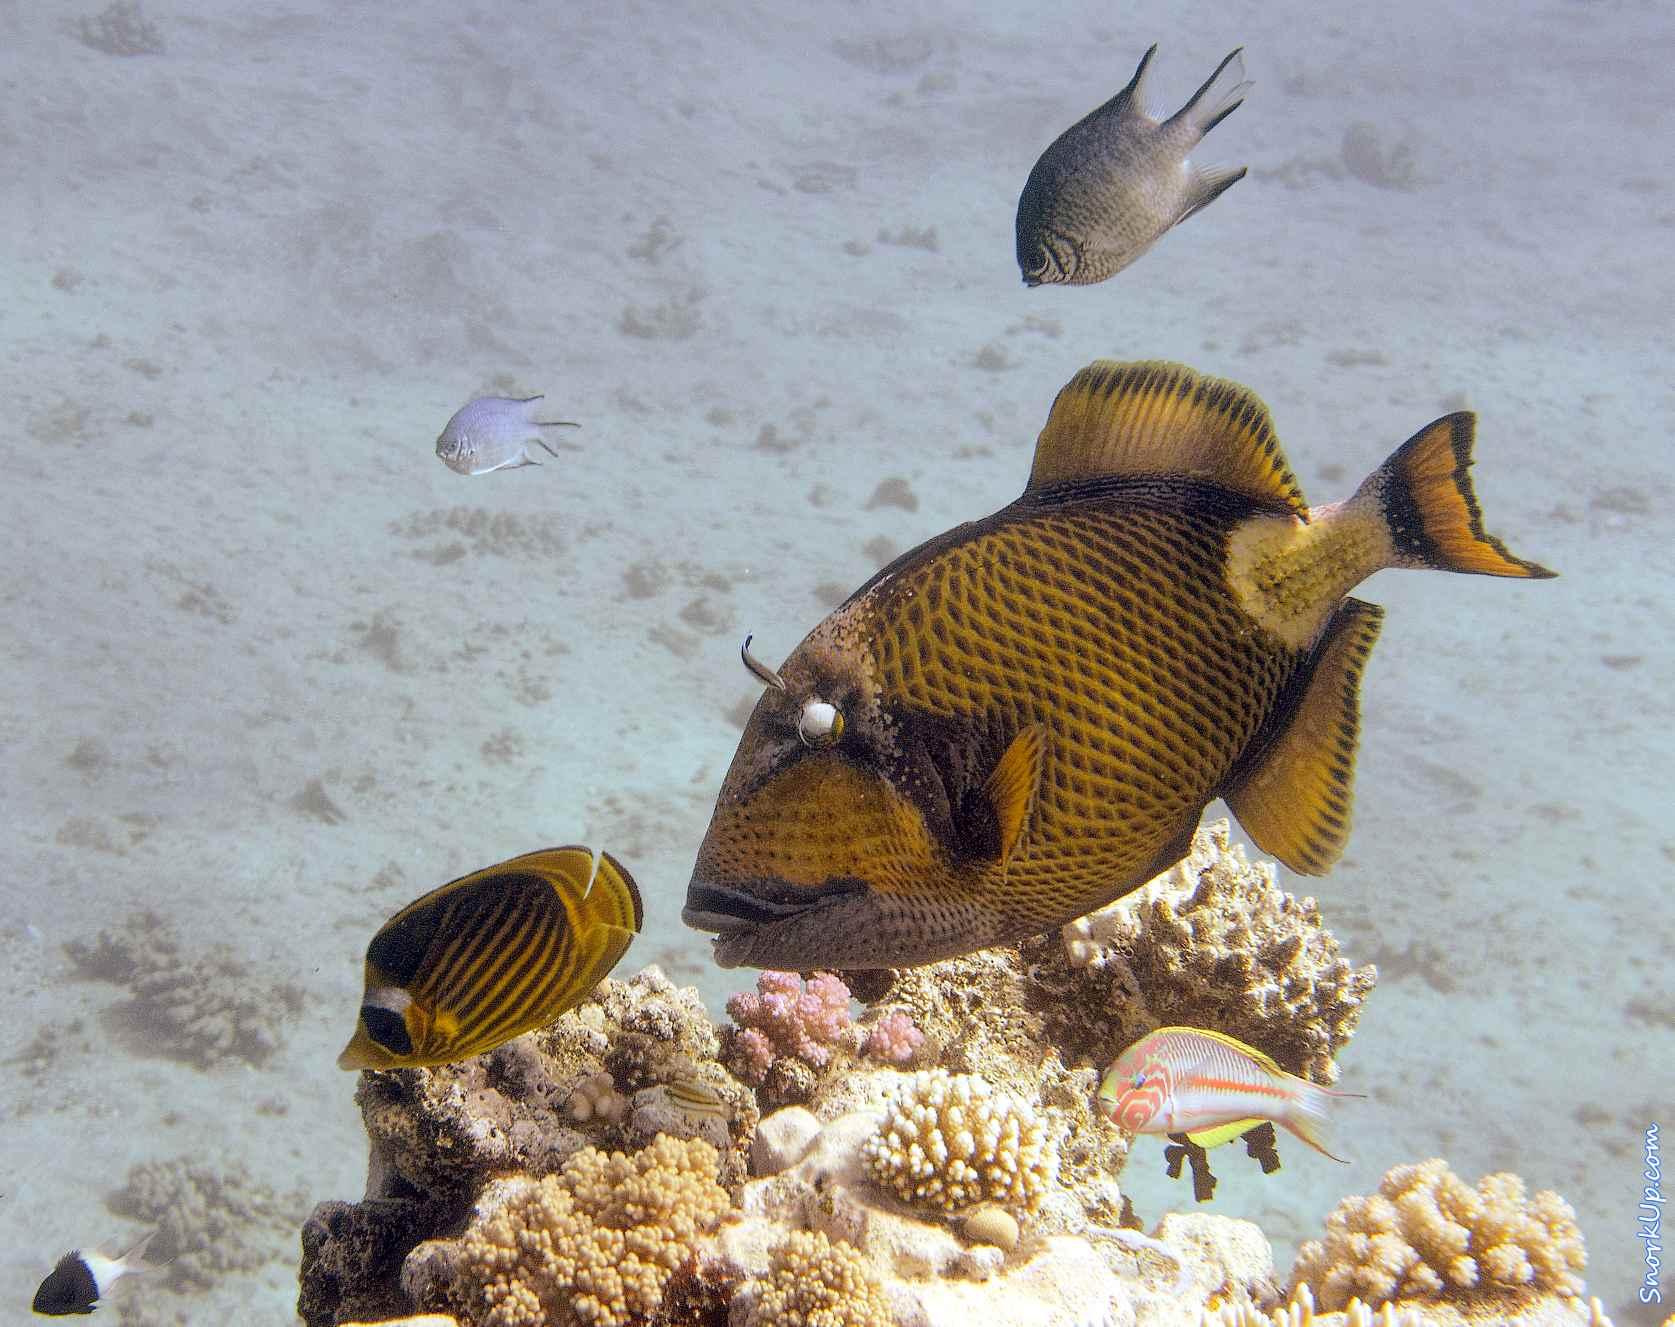 Cпинорог титан (лат.Balistoides viridescens, анг. Titan triggerfish)  - cнорклинг в Shams Alam.